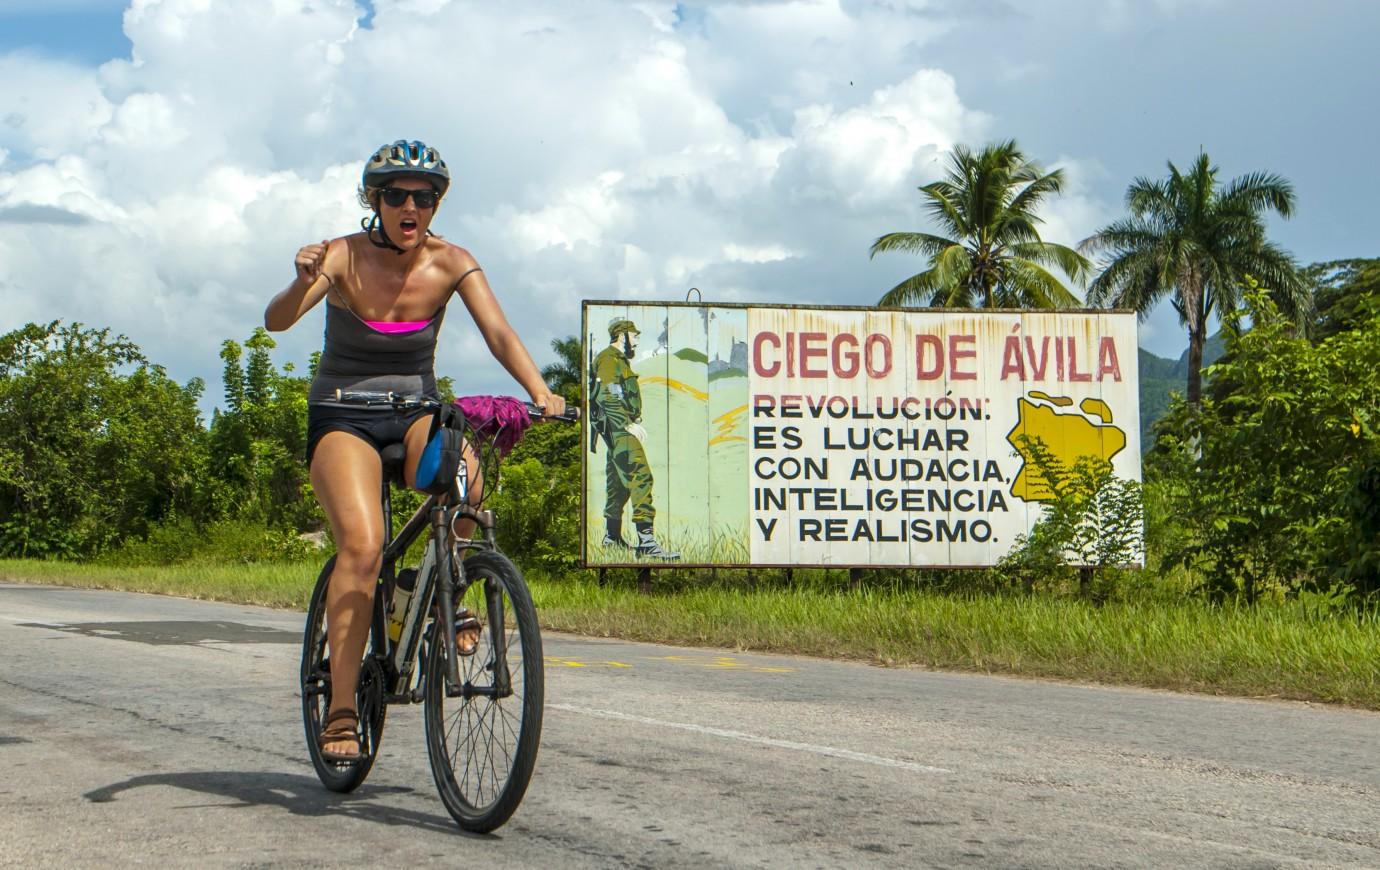 c621480be Cycling holiday in Cuba - KE Adventure Travel